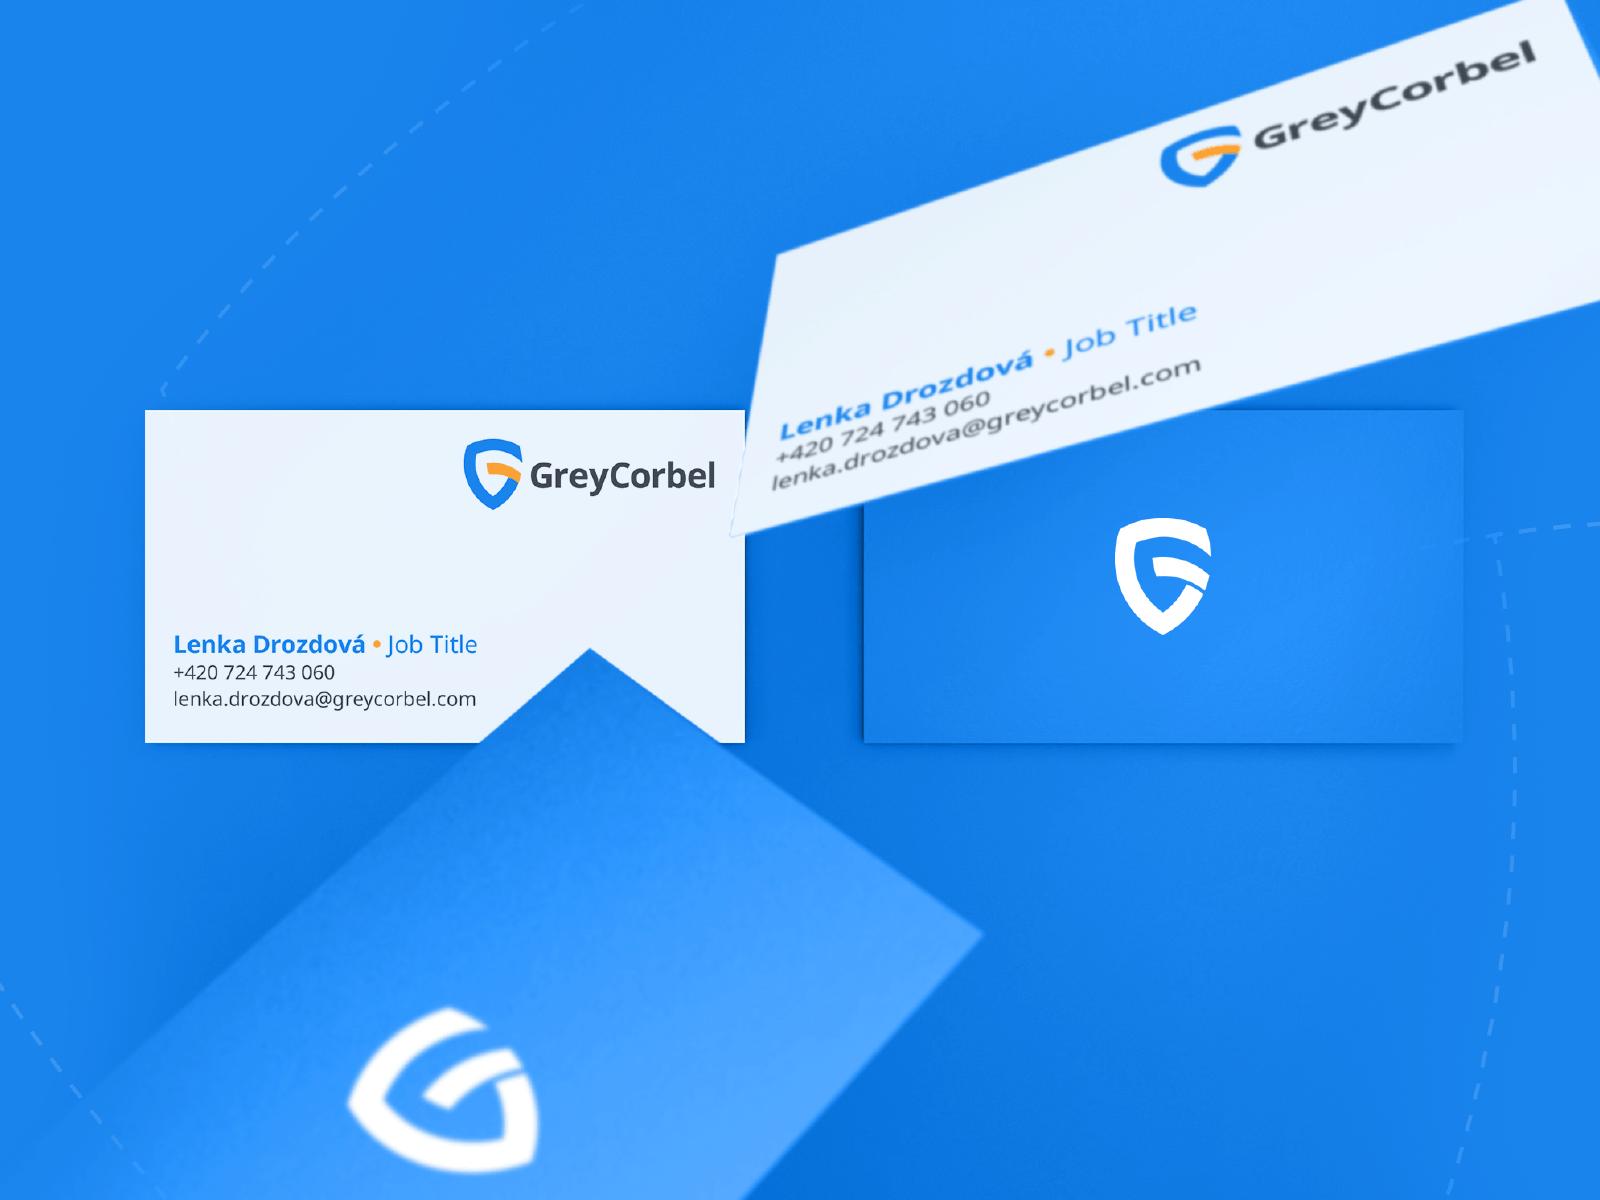 Greycorbel - branding, digital branding, logo design, visual identity, brand identity